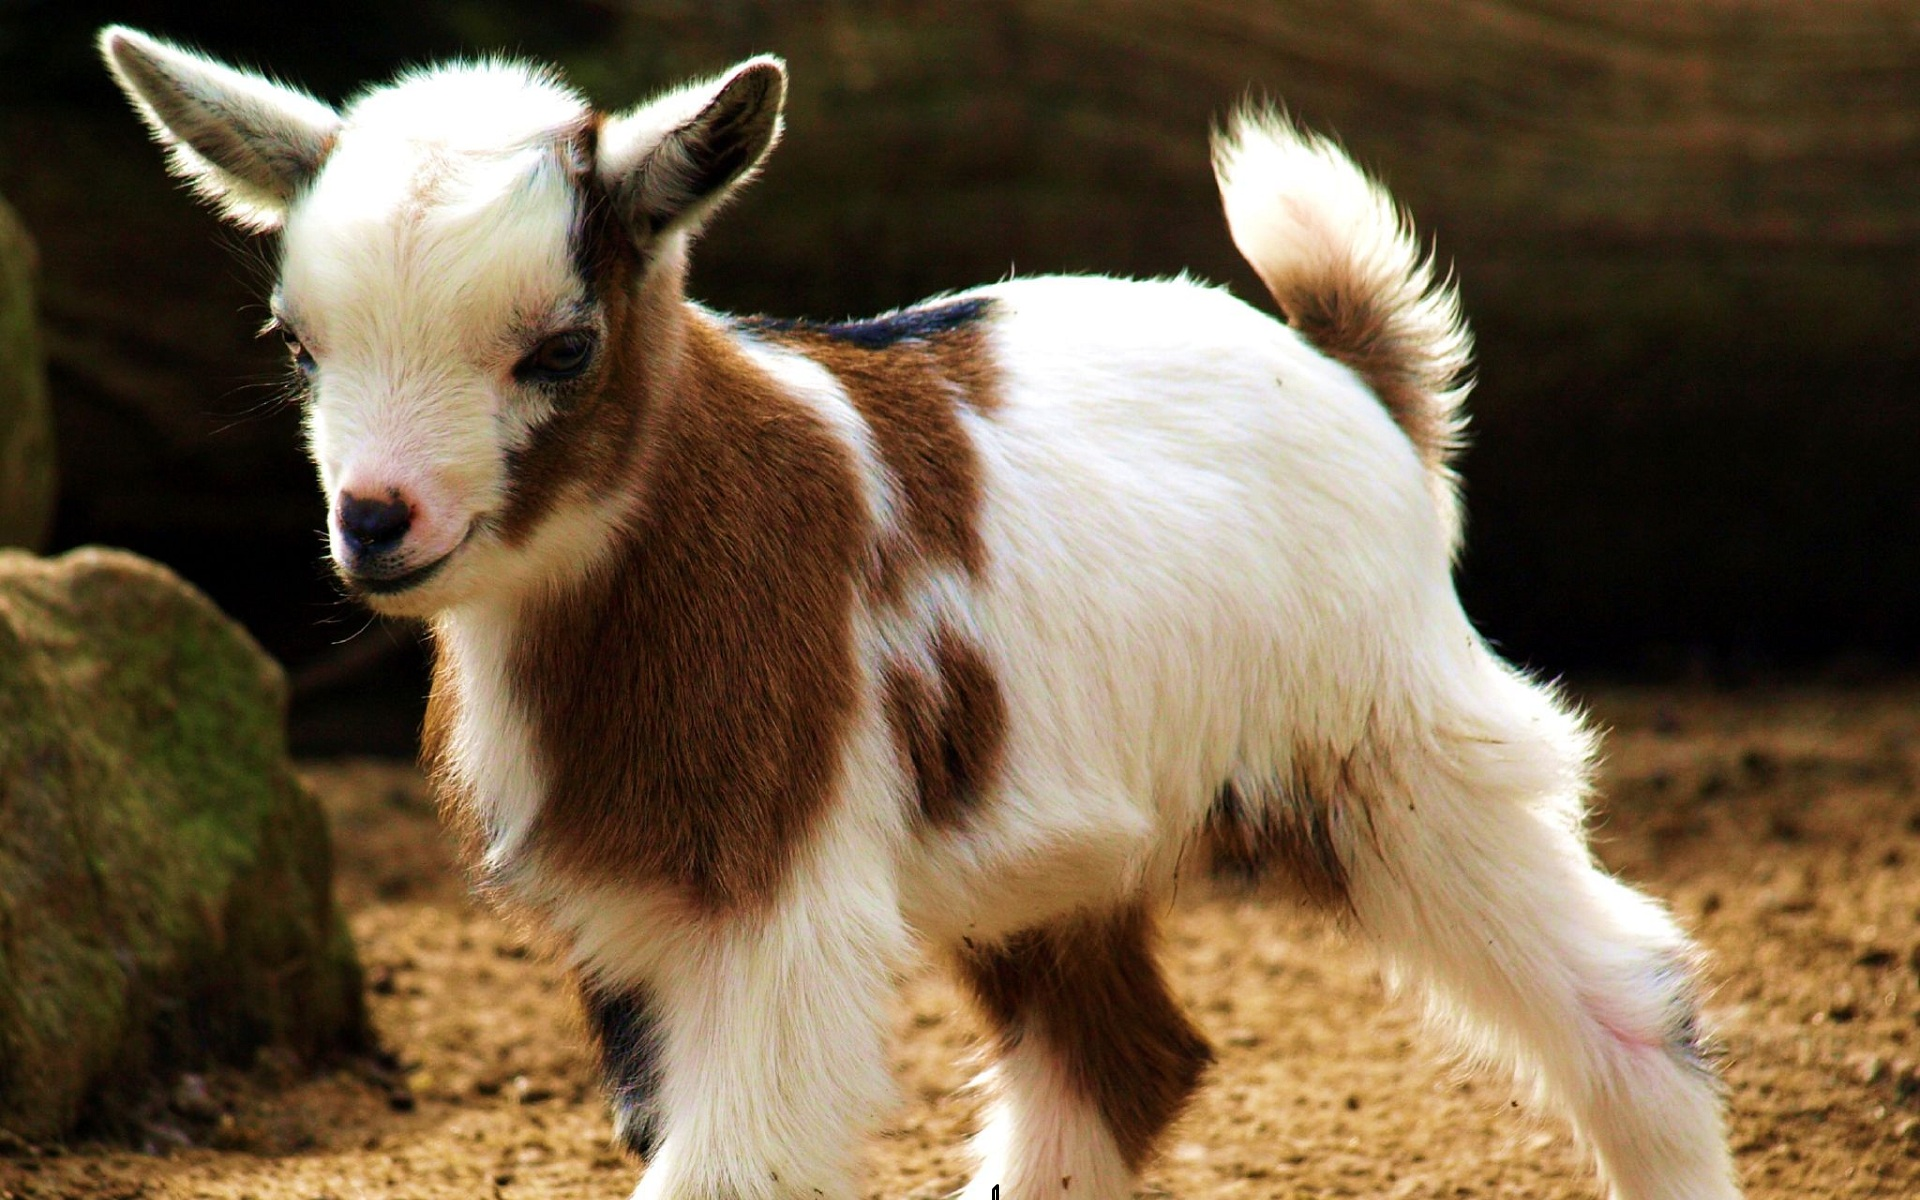 Adorable Goat Wallpaper · Cute Goat Wallpaper ...